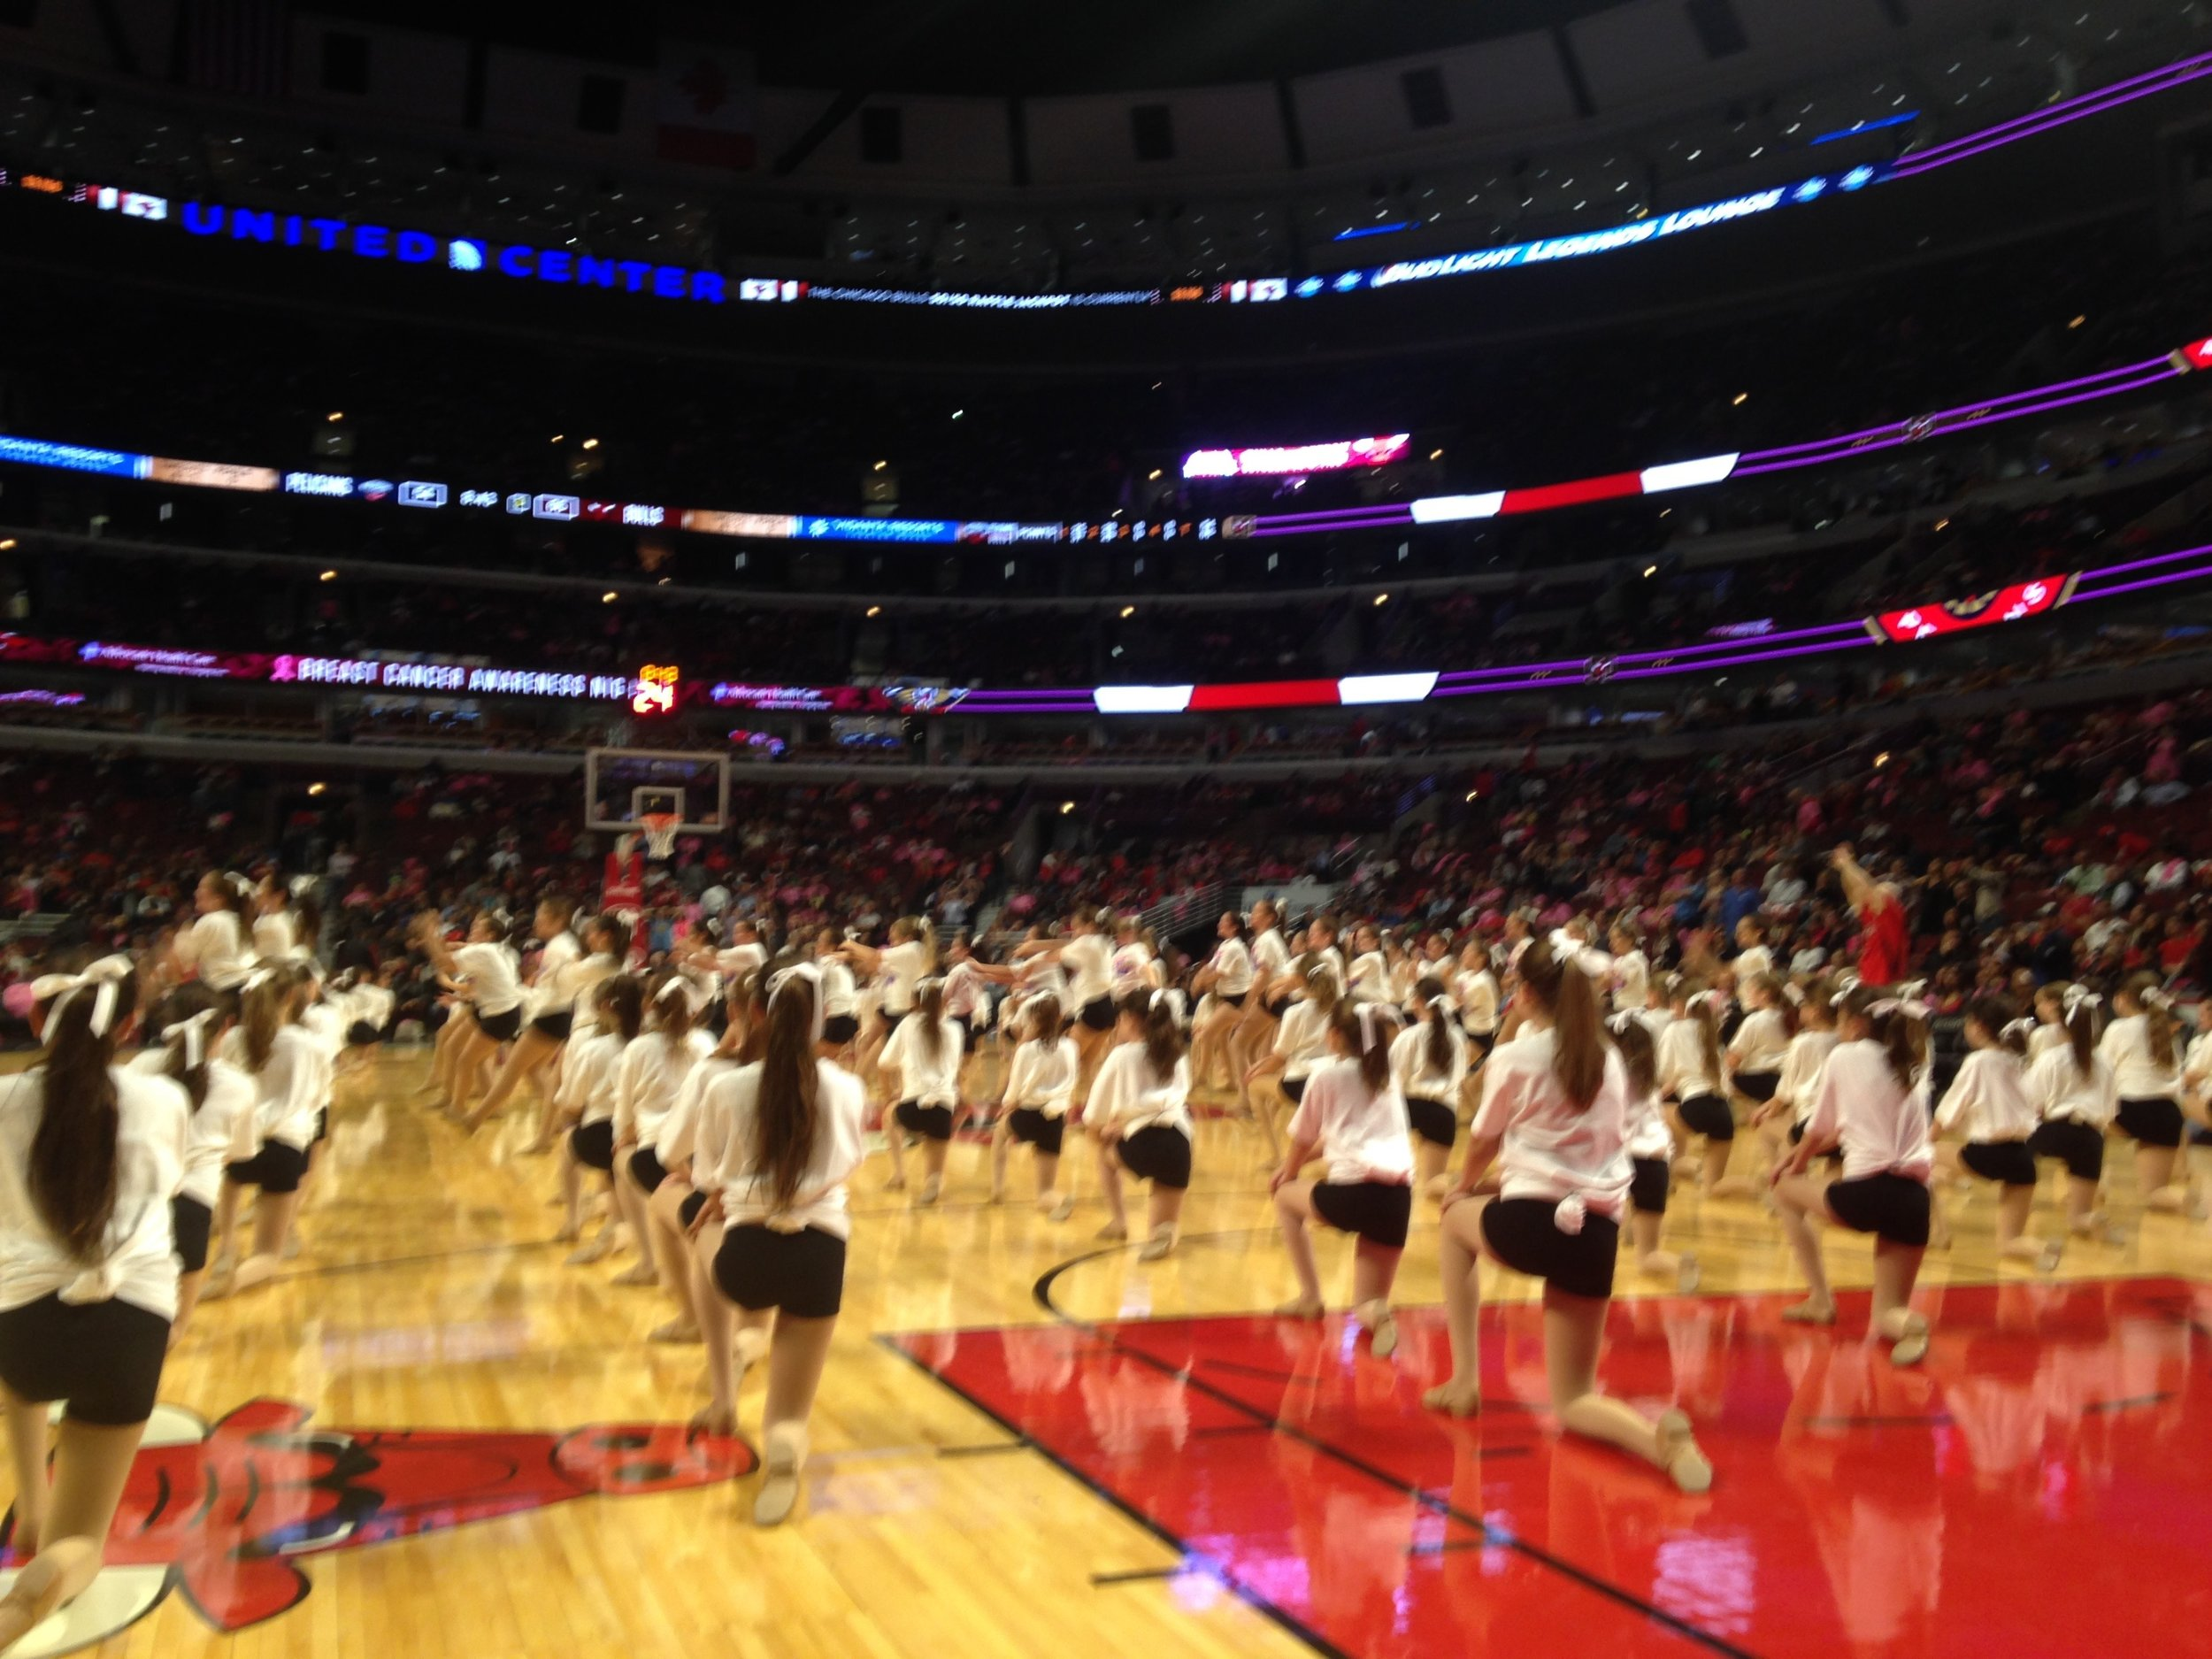 DancEd Dance Center center court at a Chicago Bulls game.